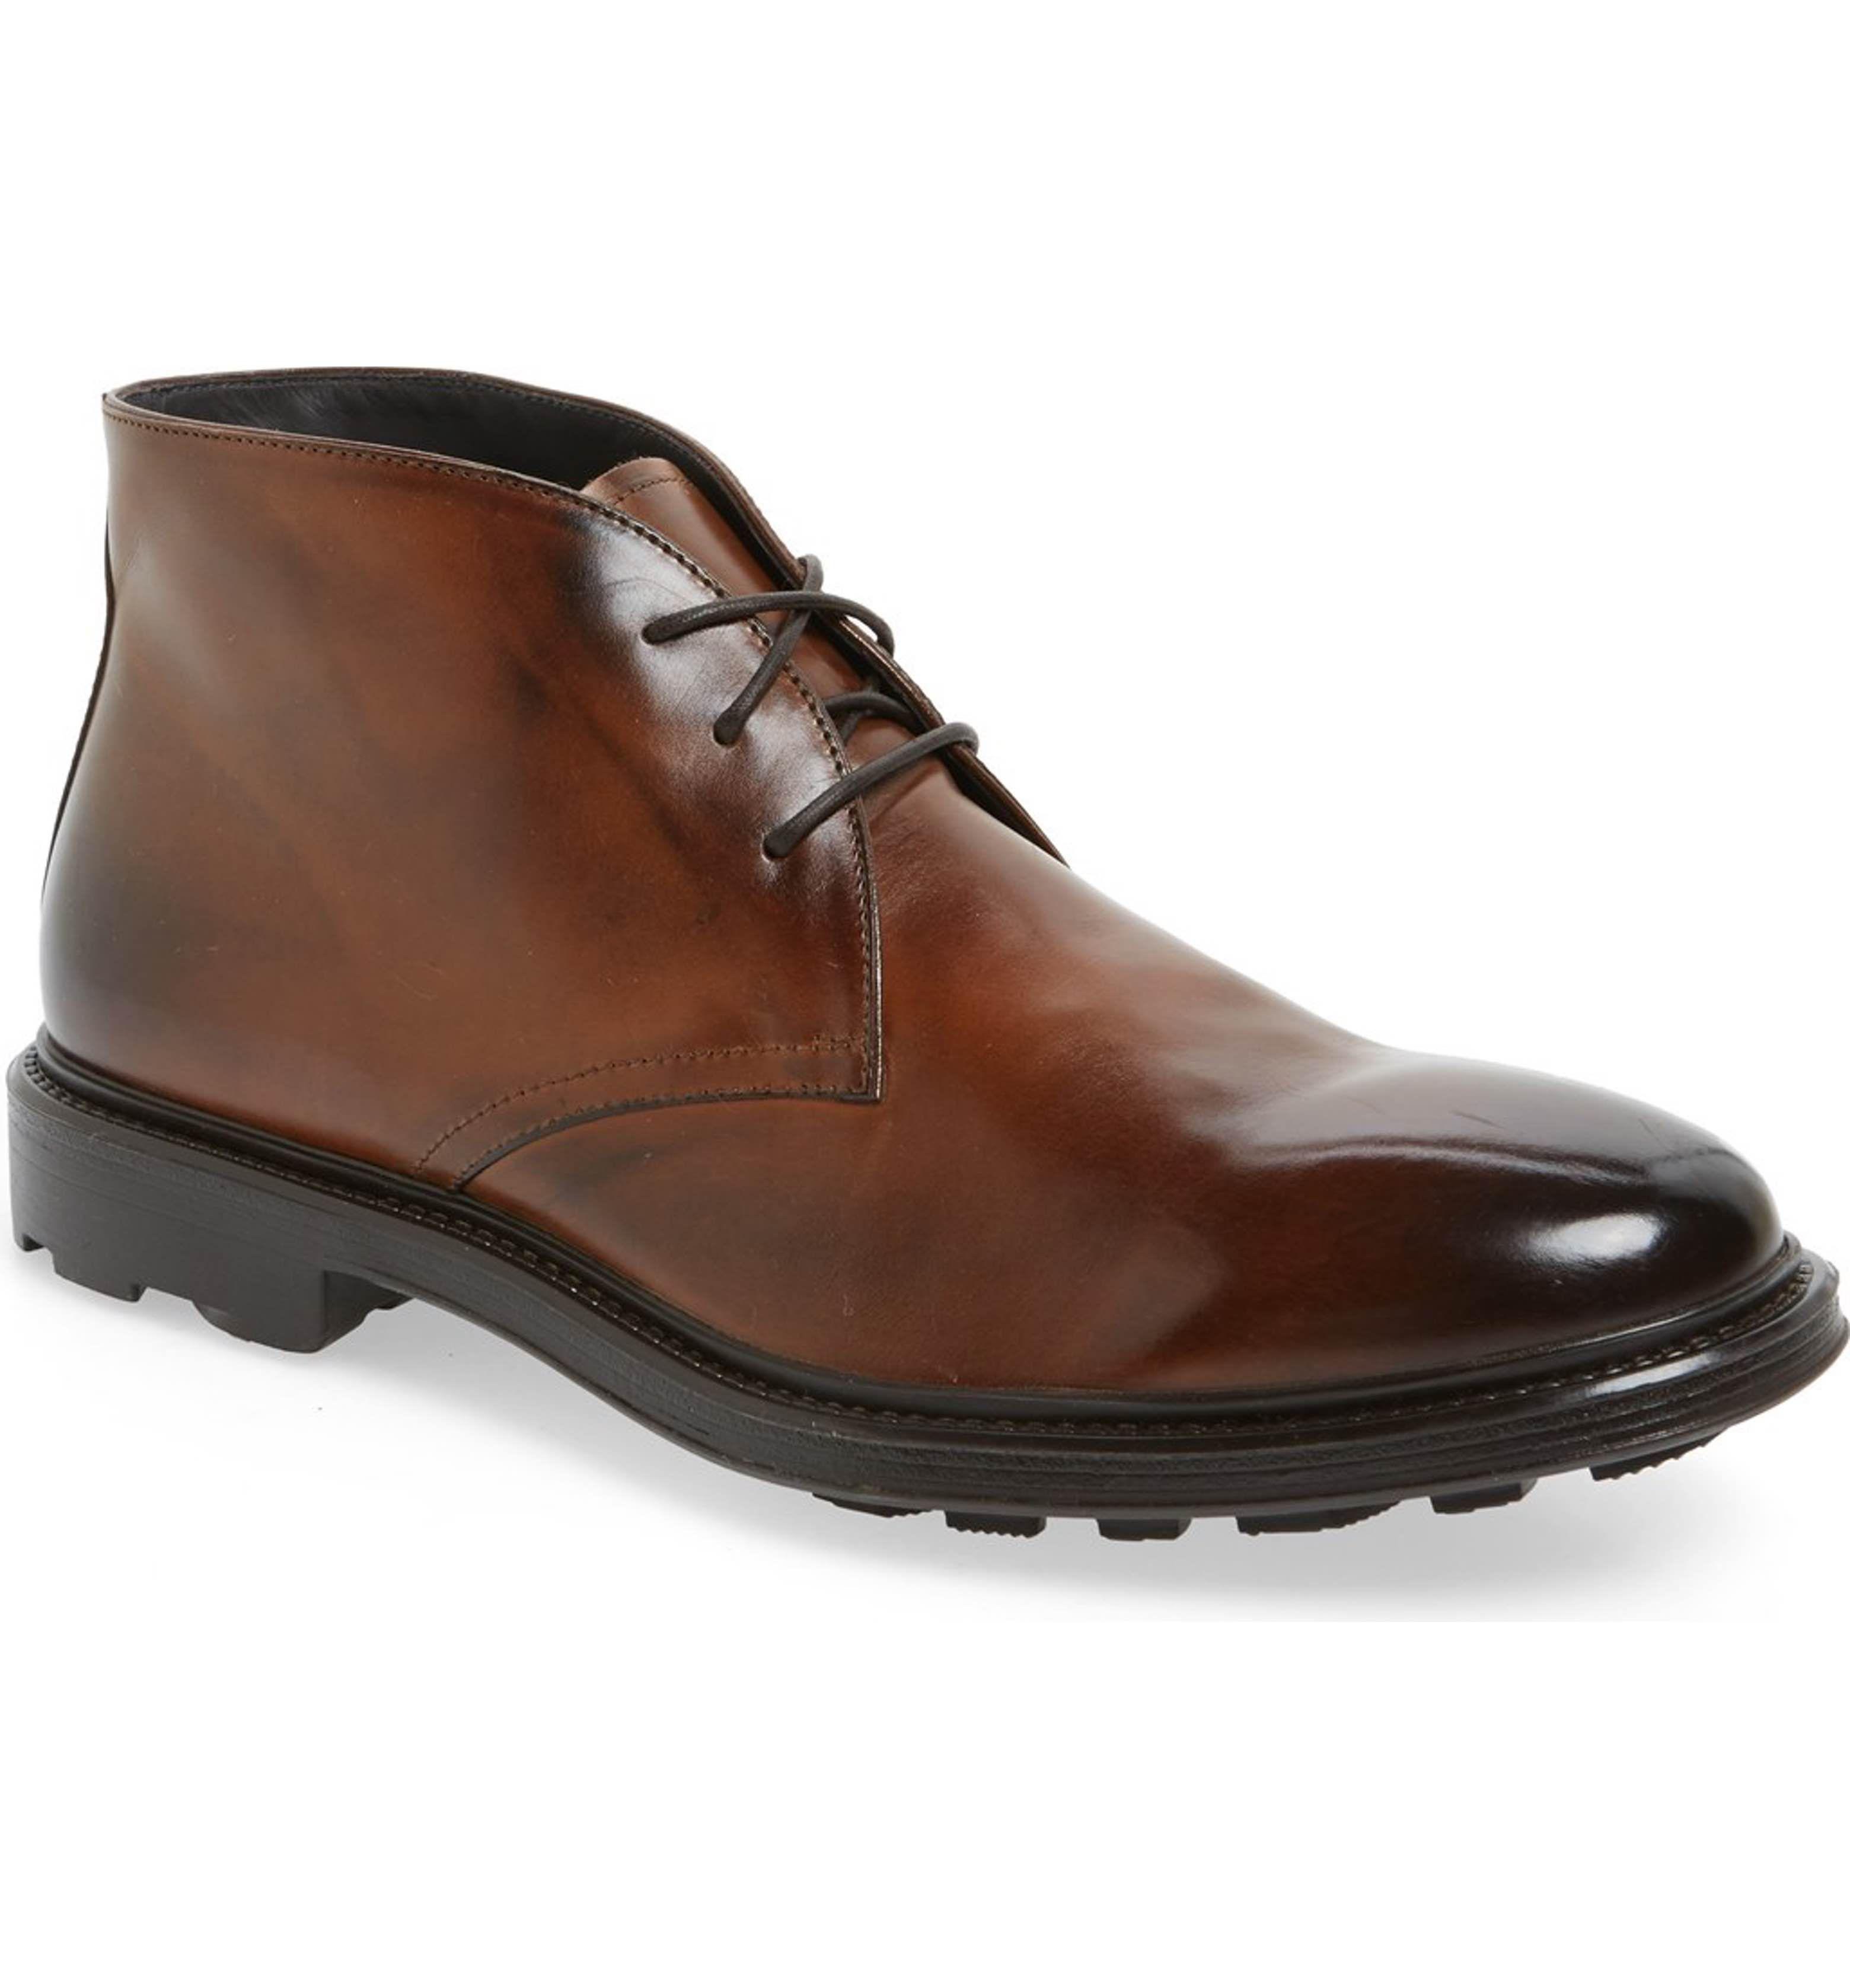 Main Image - To Boot New York 'Jarrod' Chukka Boot (Men)